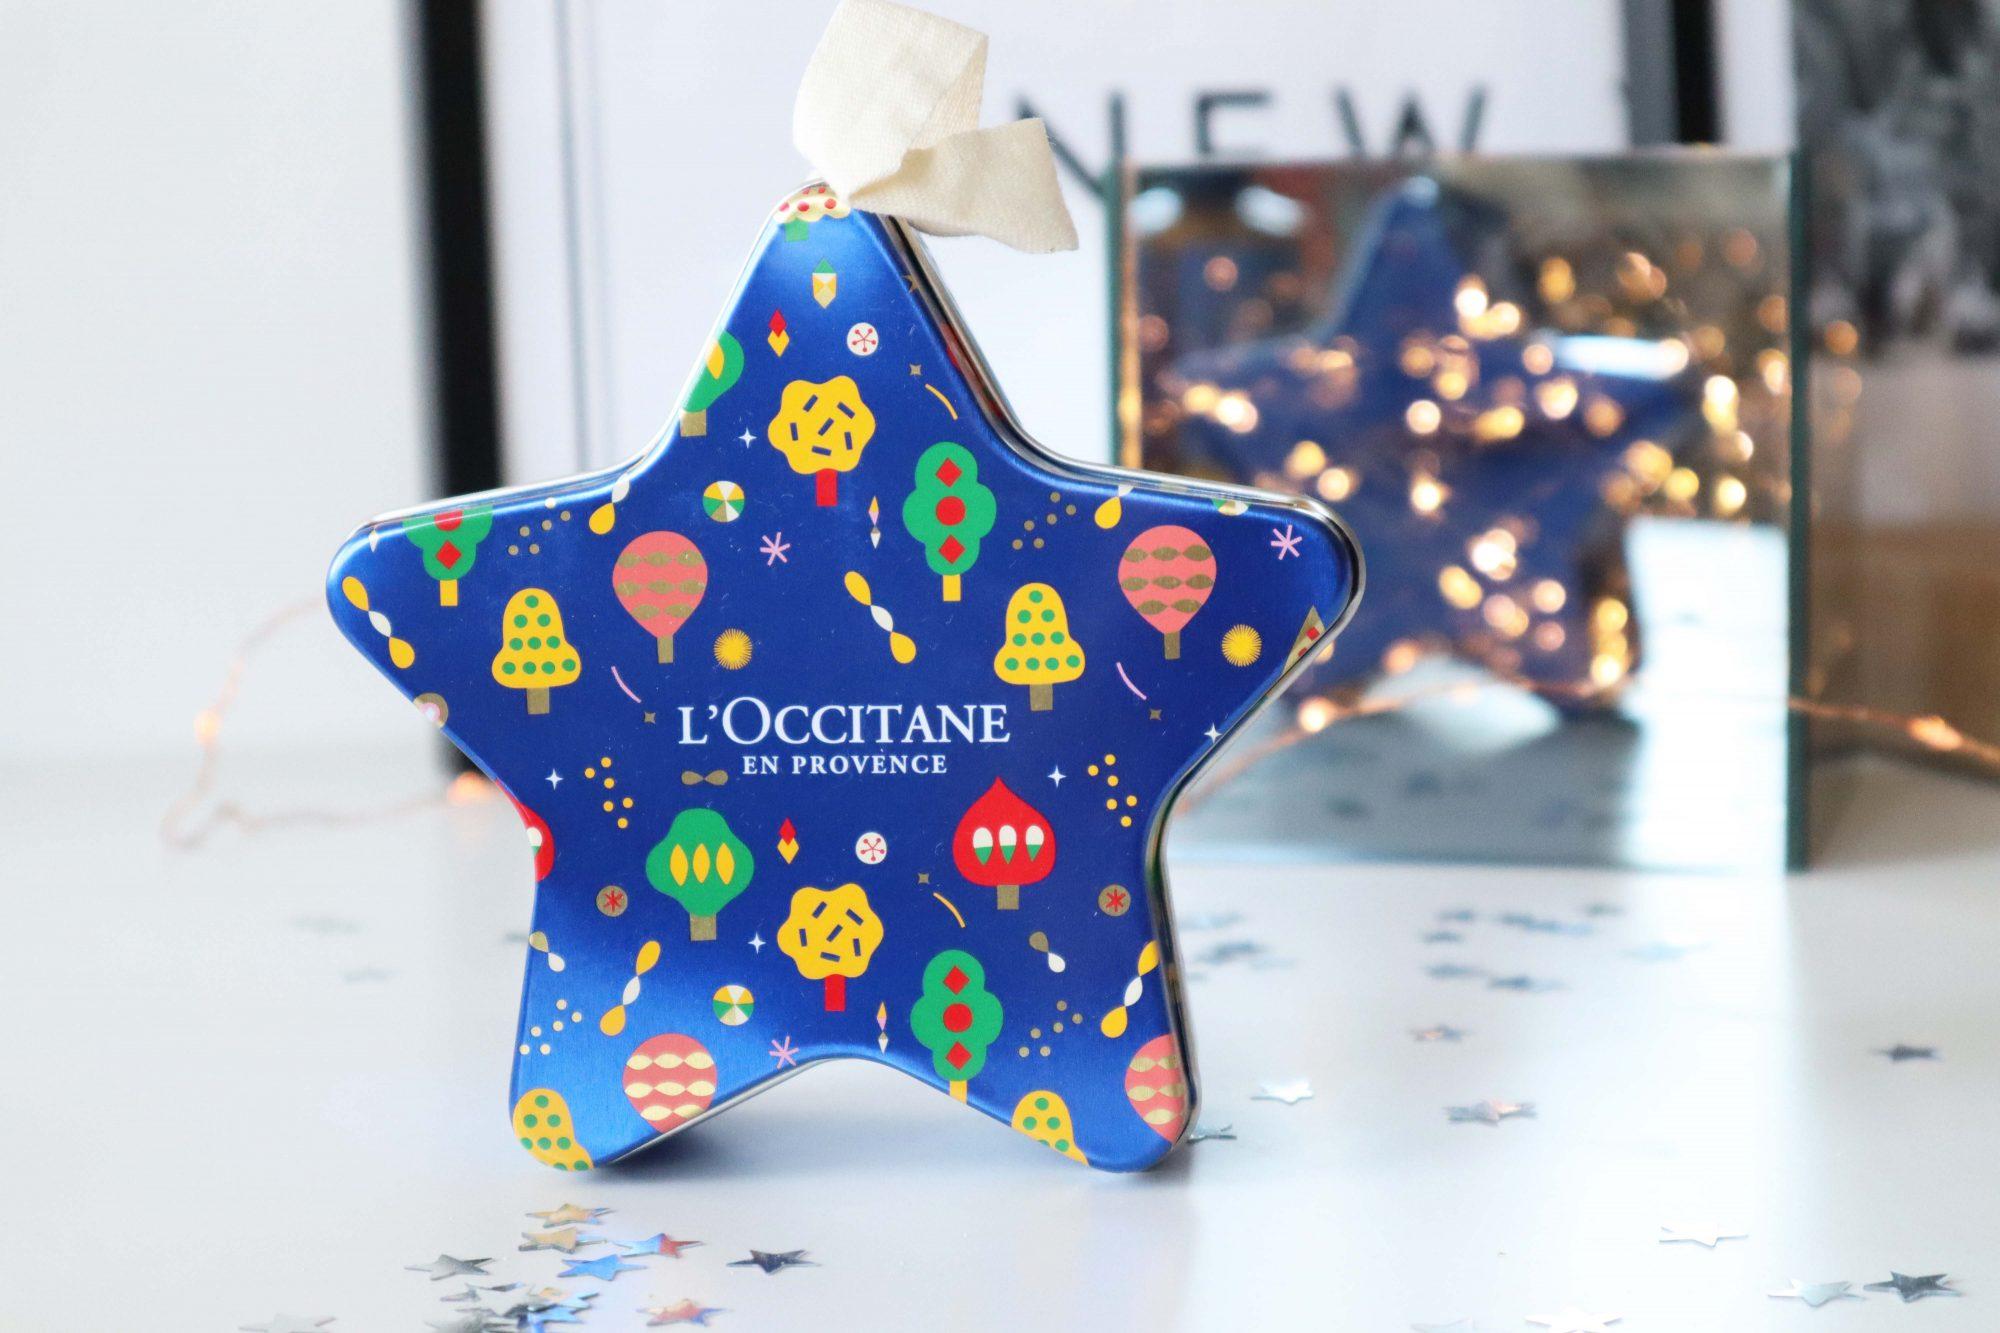 L'Occitane Kerstcollectie